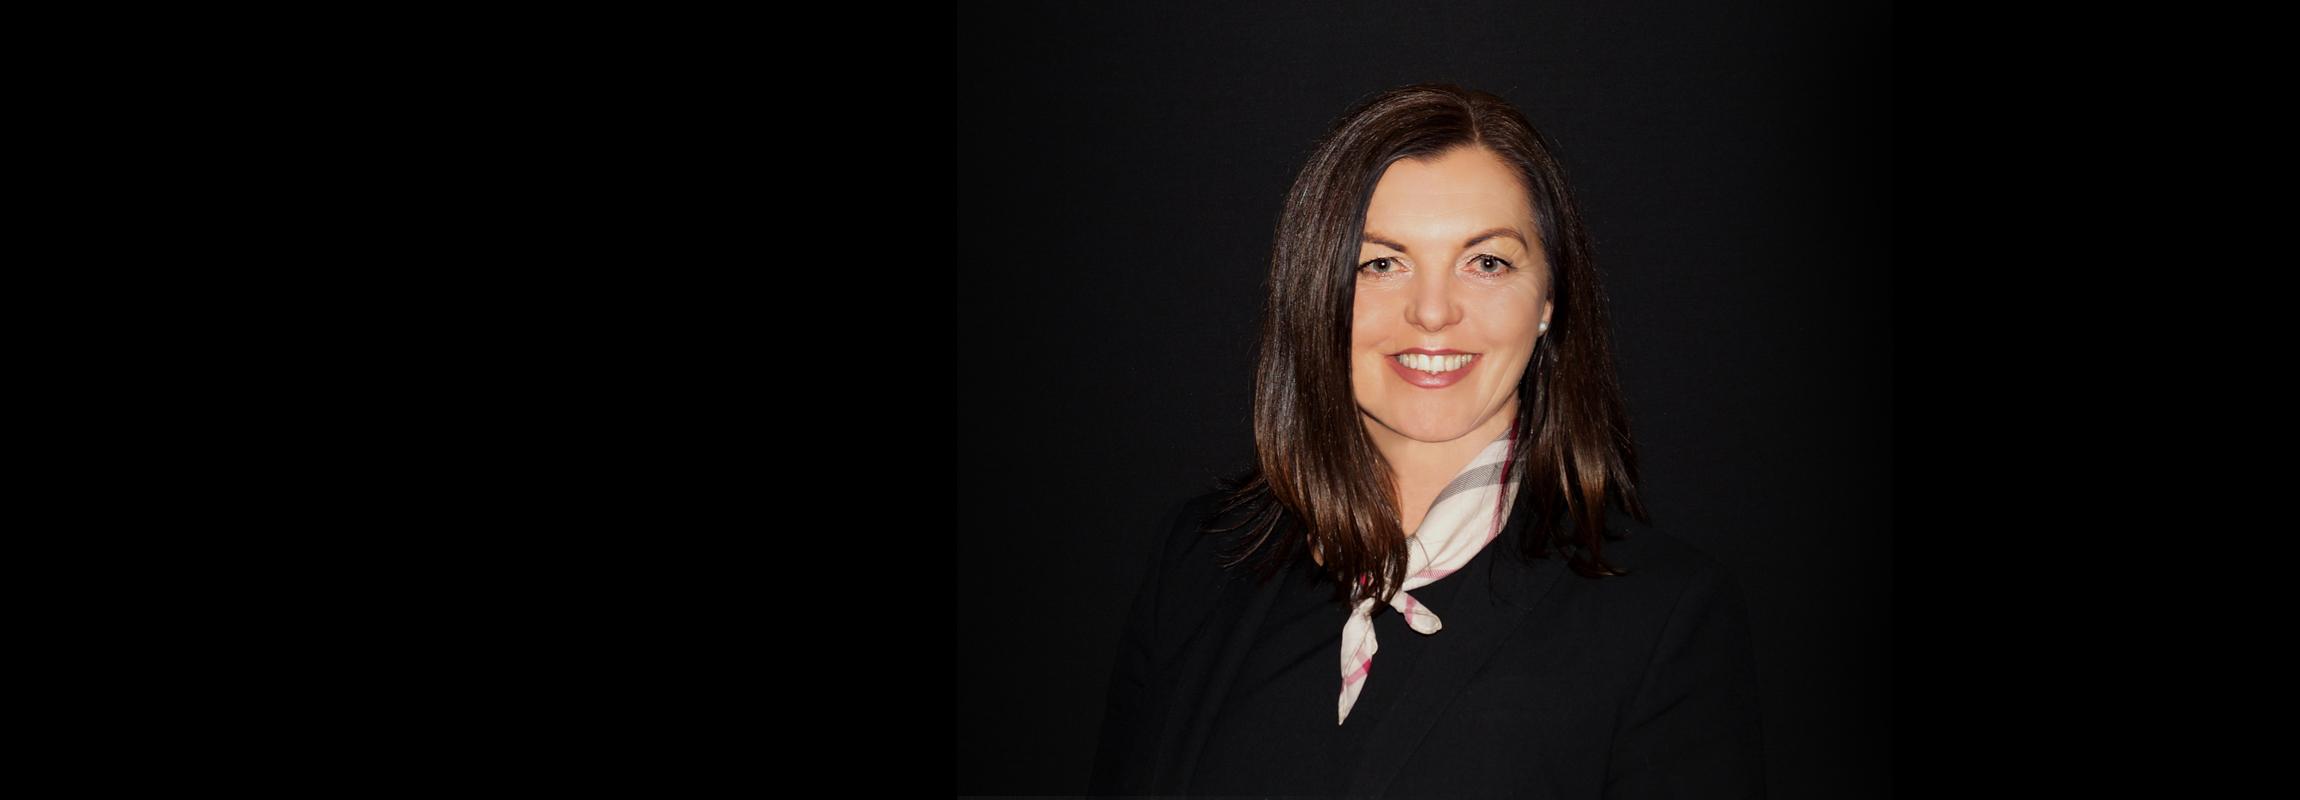 Dr. Christina Nigg Slider 1